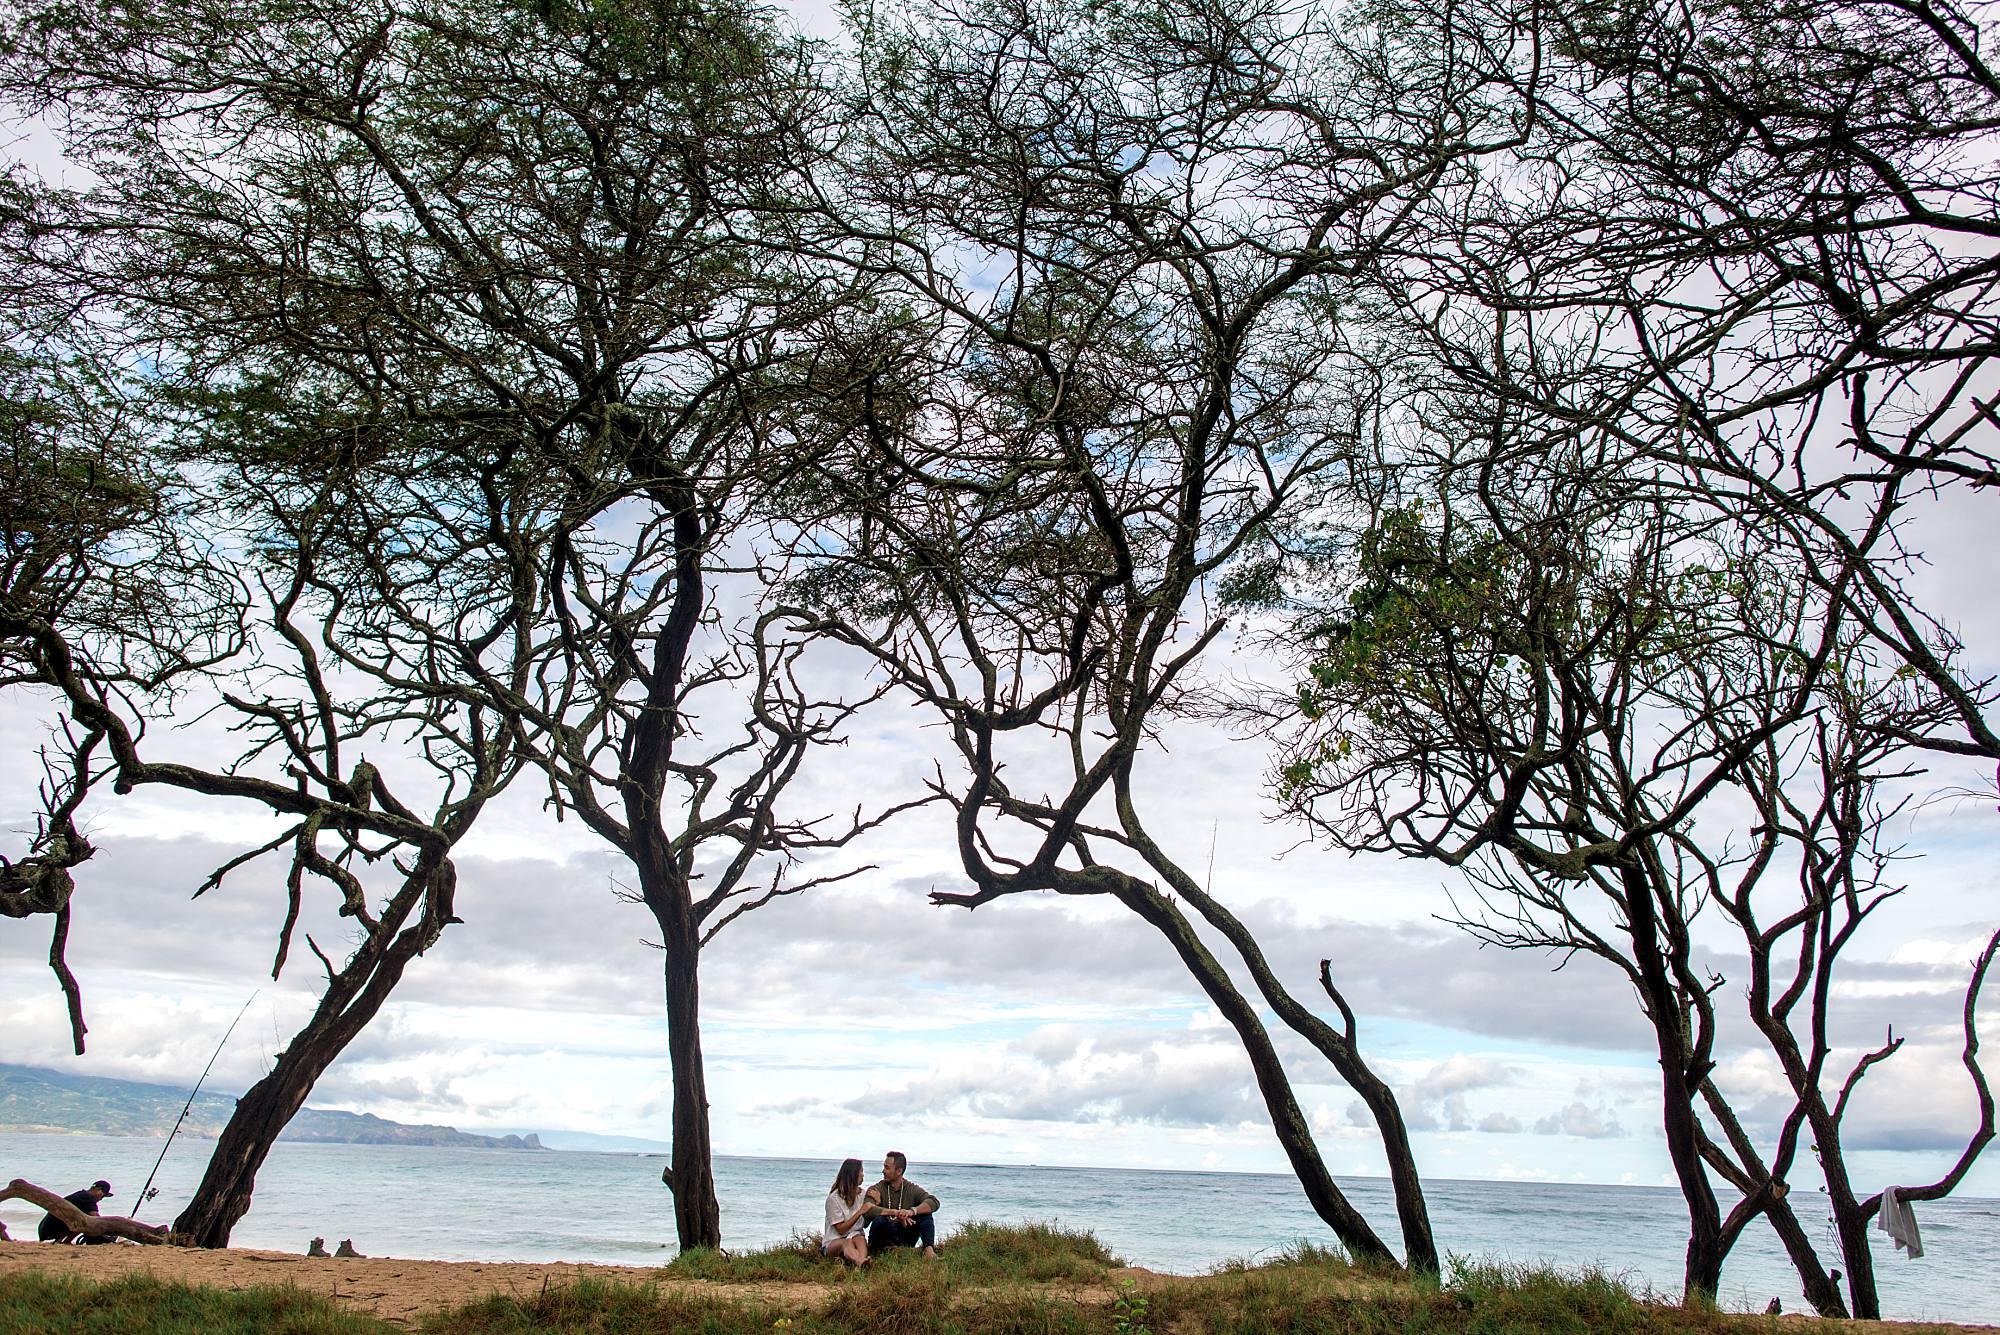 couple sitting under trees on Maui beach